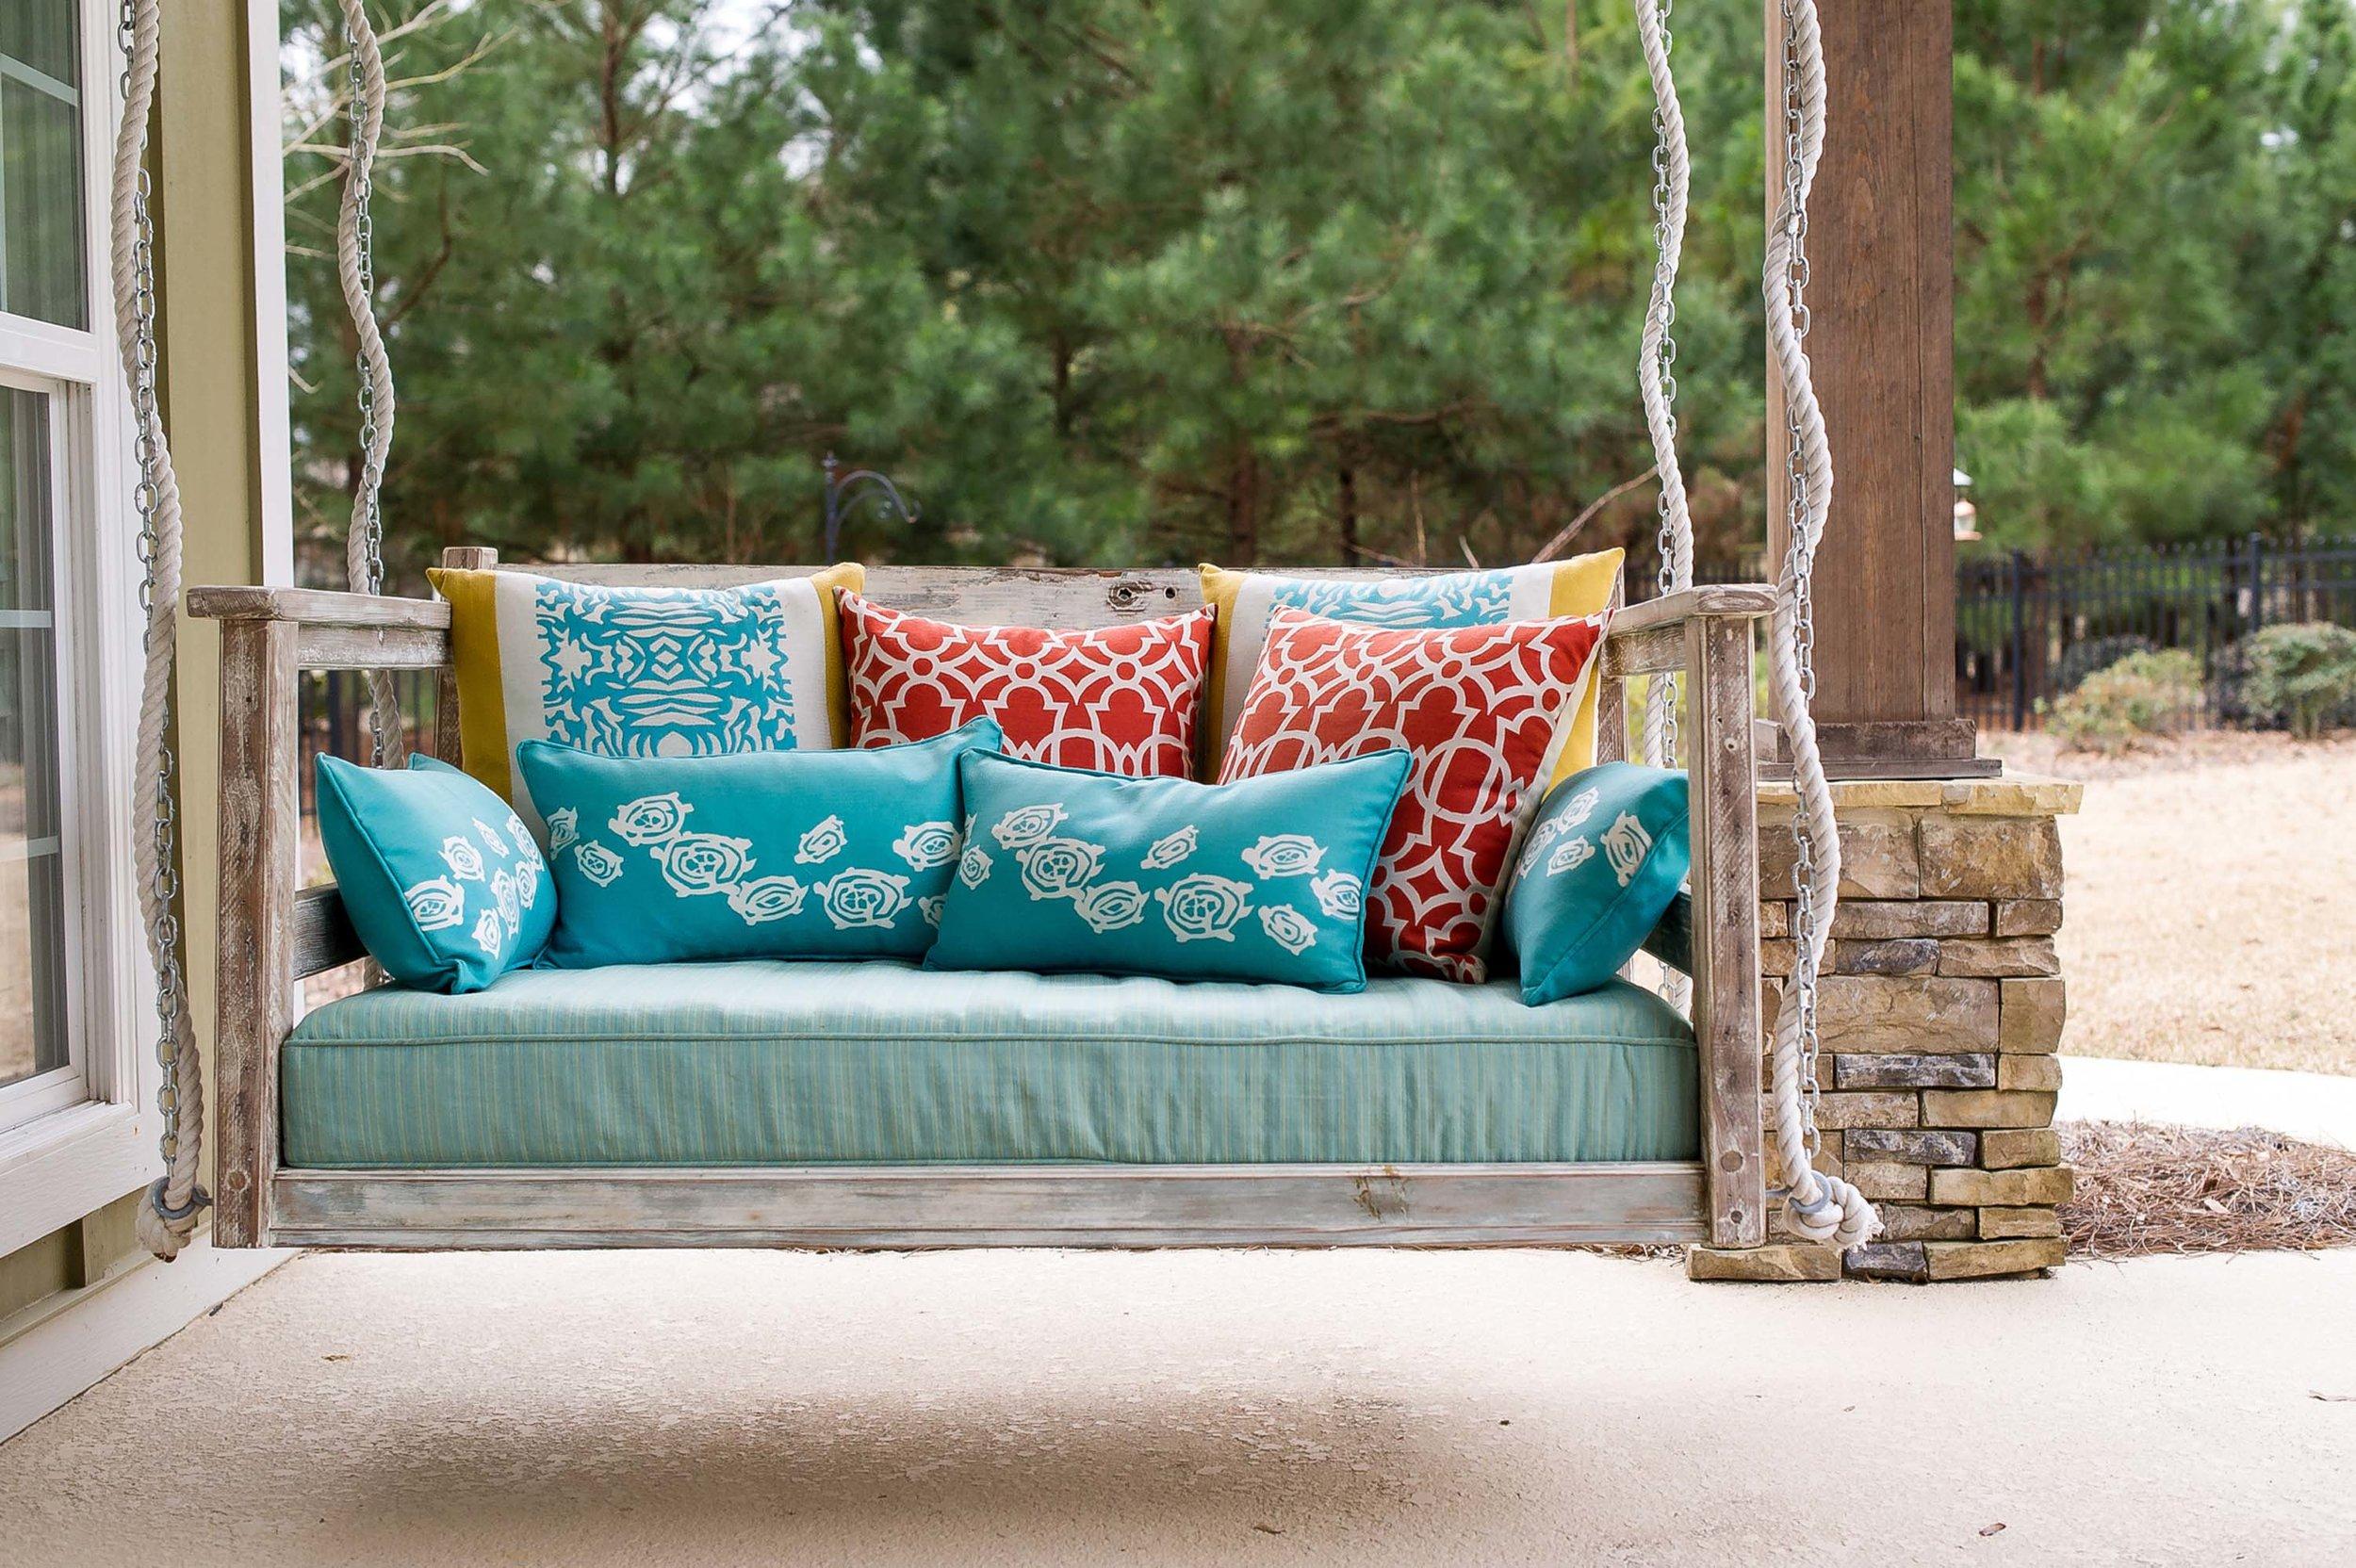 Custom Swing with Elaine Smith Pillows